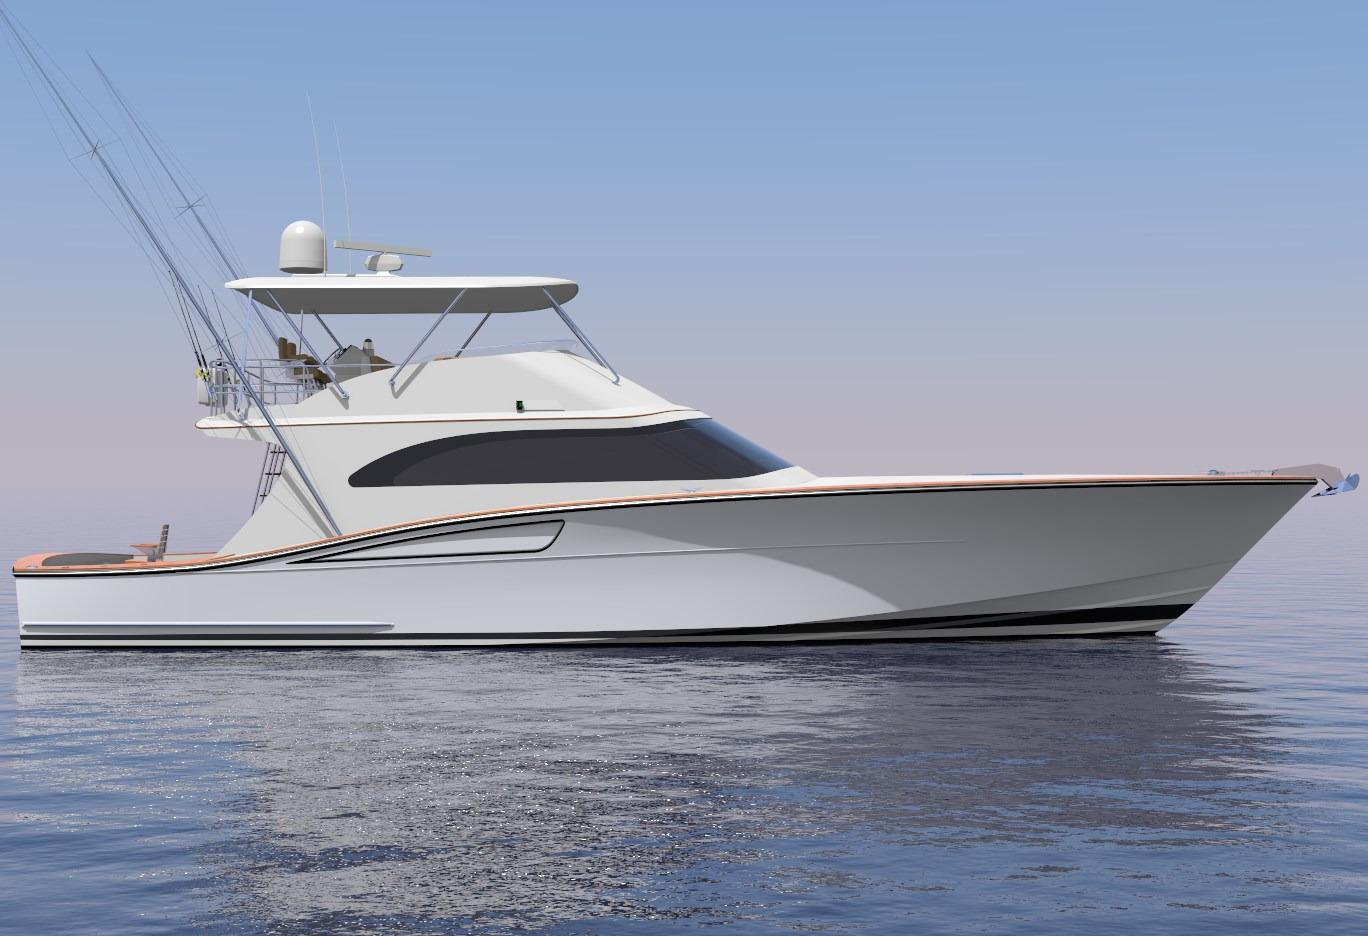 2018 Brooklin Boat Yard 65 Sportfish Power Boat For Sale